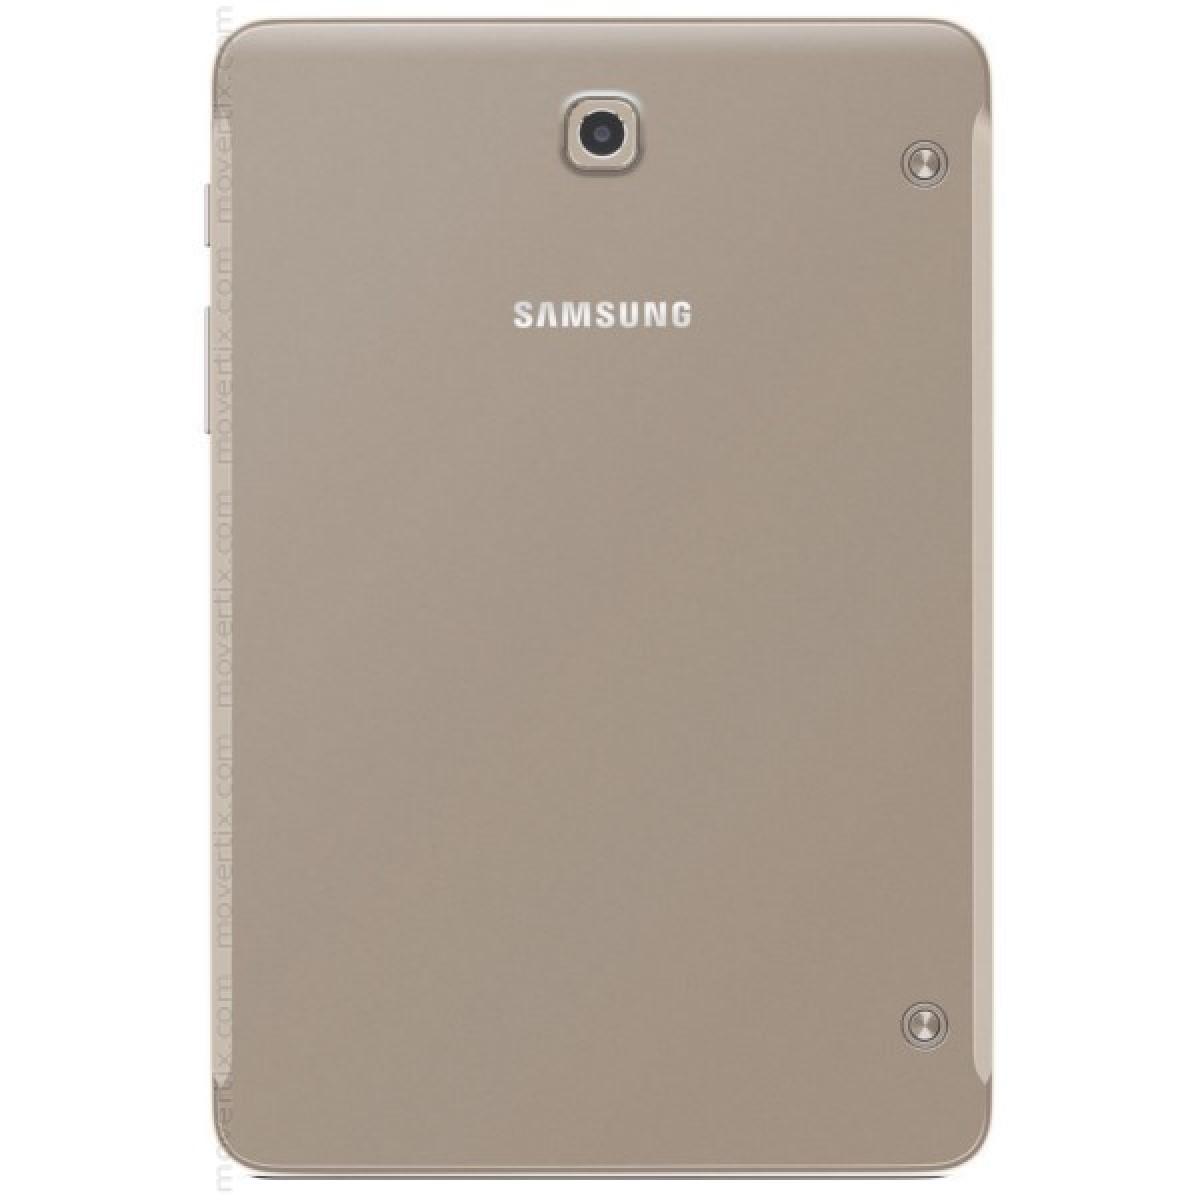 Samsung Galaxy Tab S2 4G 9.7 Gold - SM-T819 (8806088399201)   Movertix  Mobile Phones Shop 85cc3ae28070